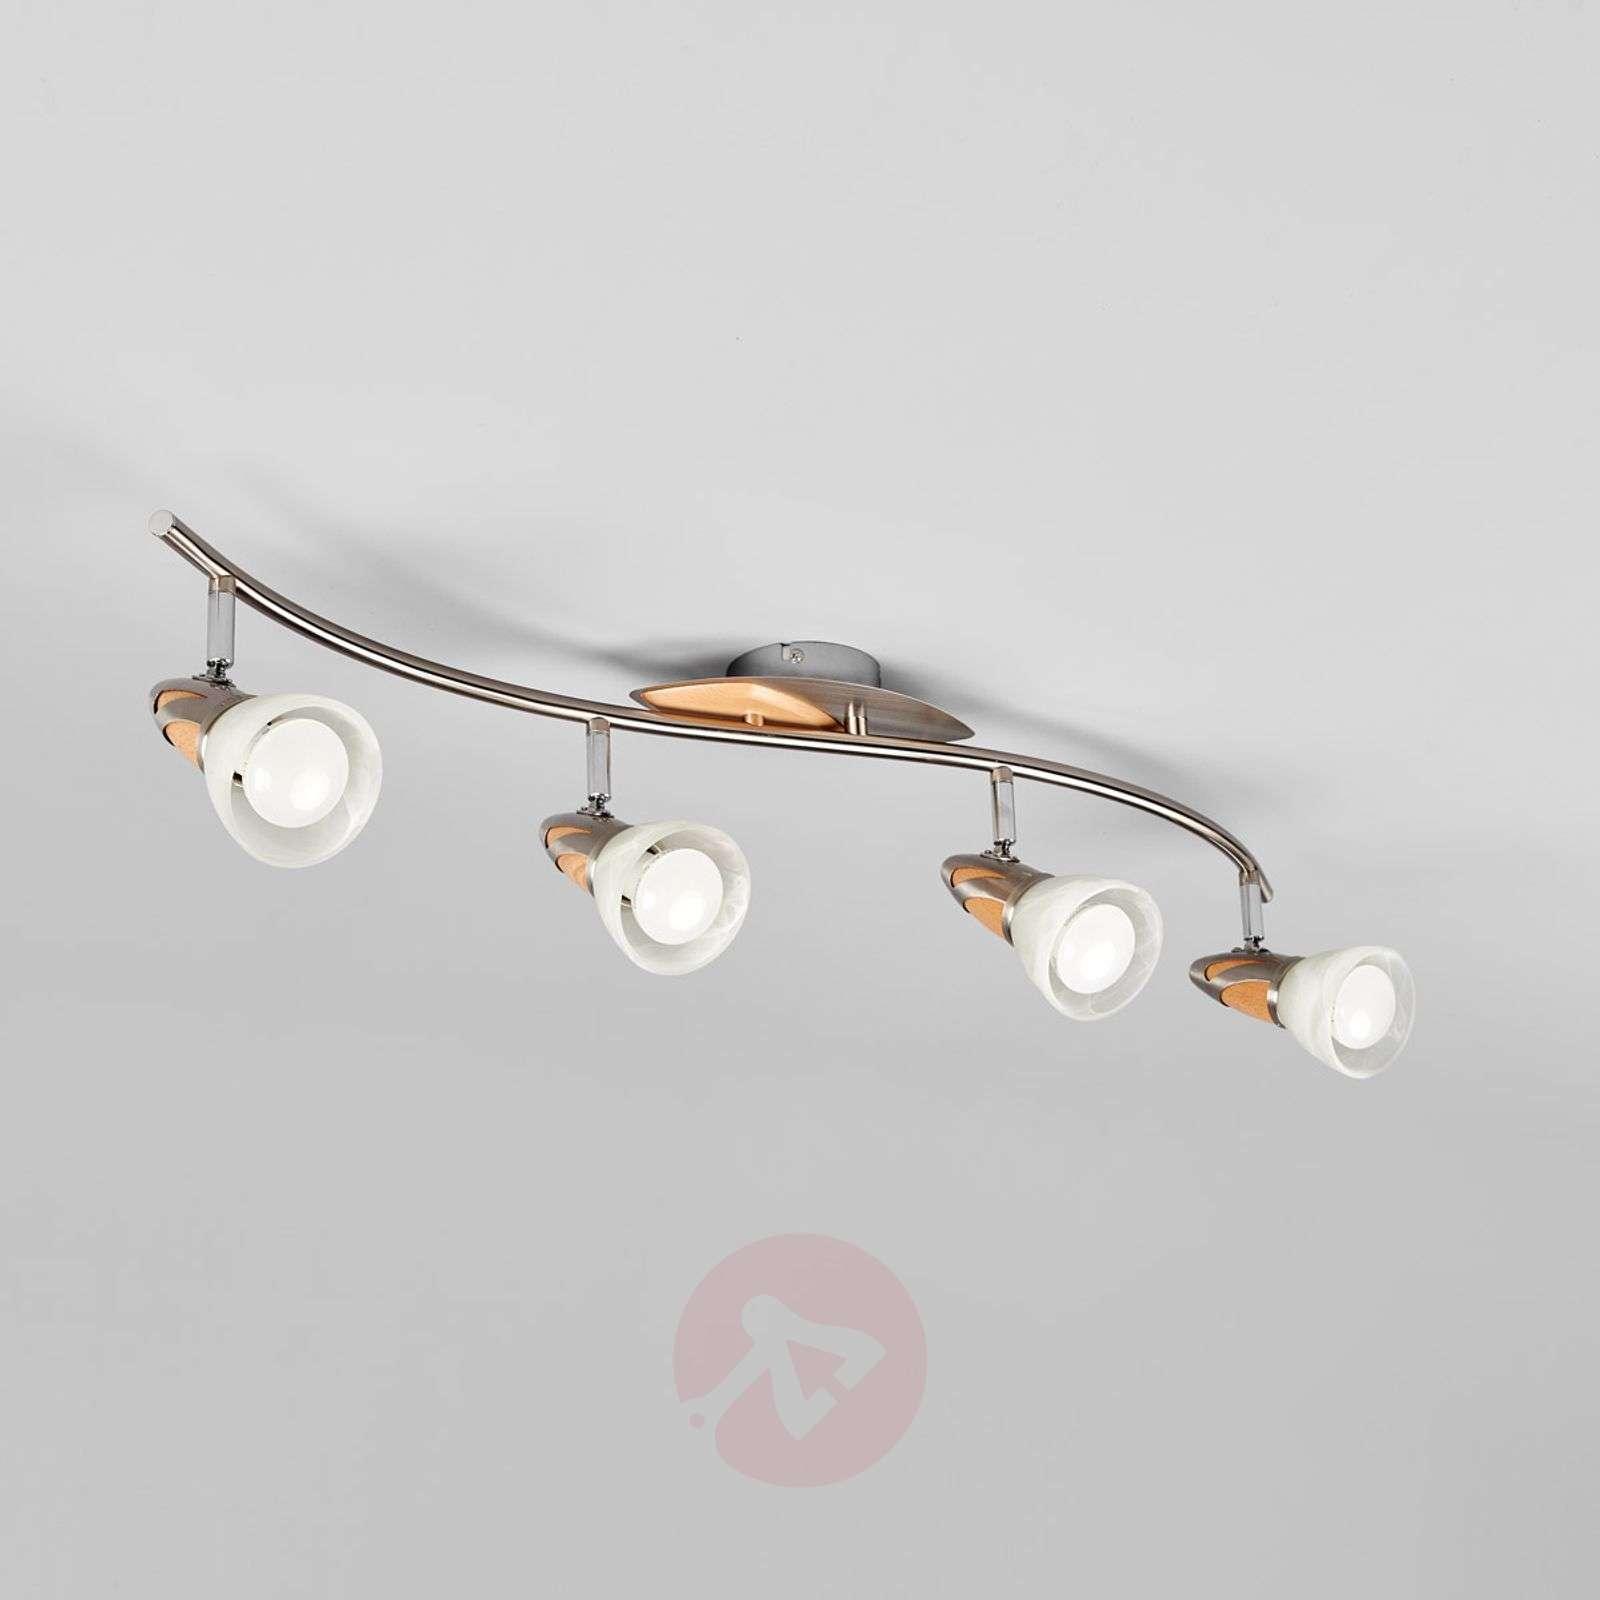 4-lamppuinen puukattovalaisin Marena, E14 LED-9620555-01